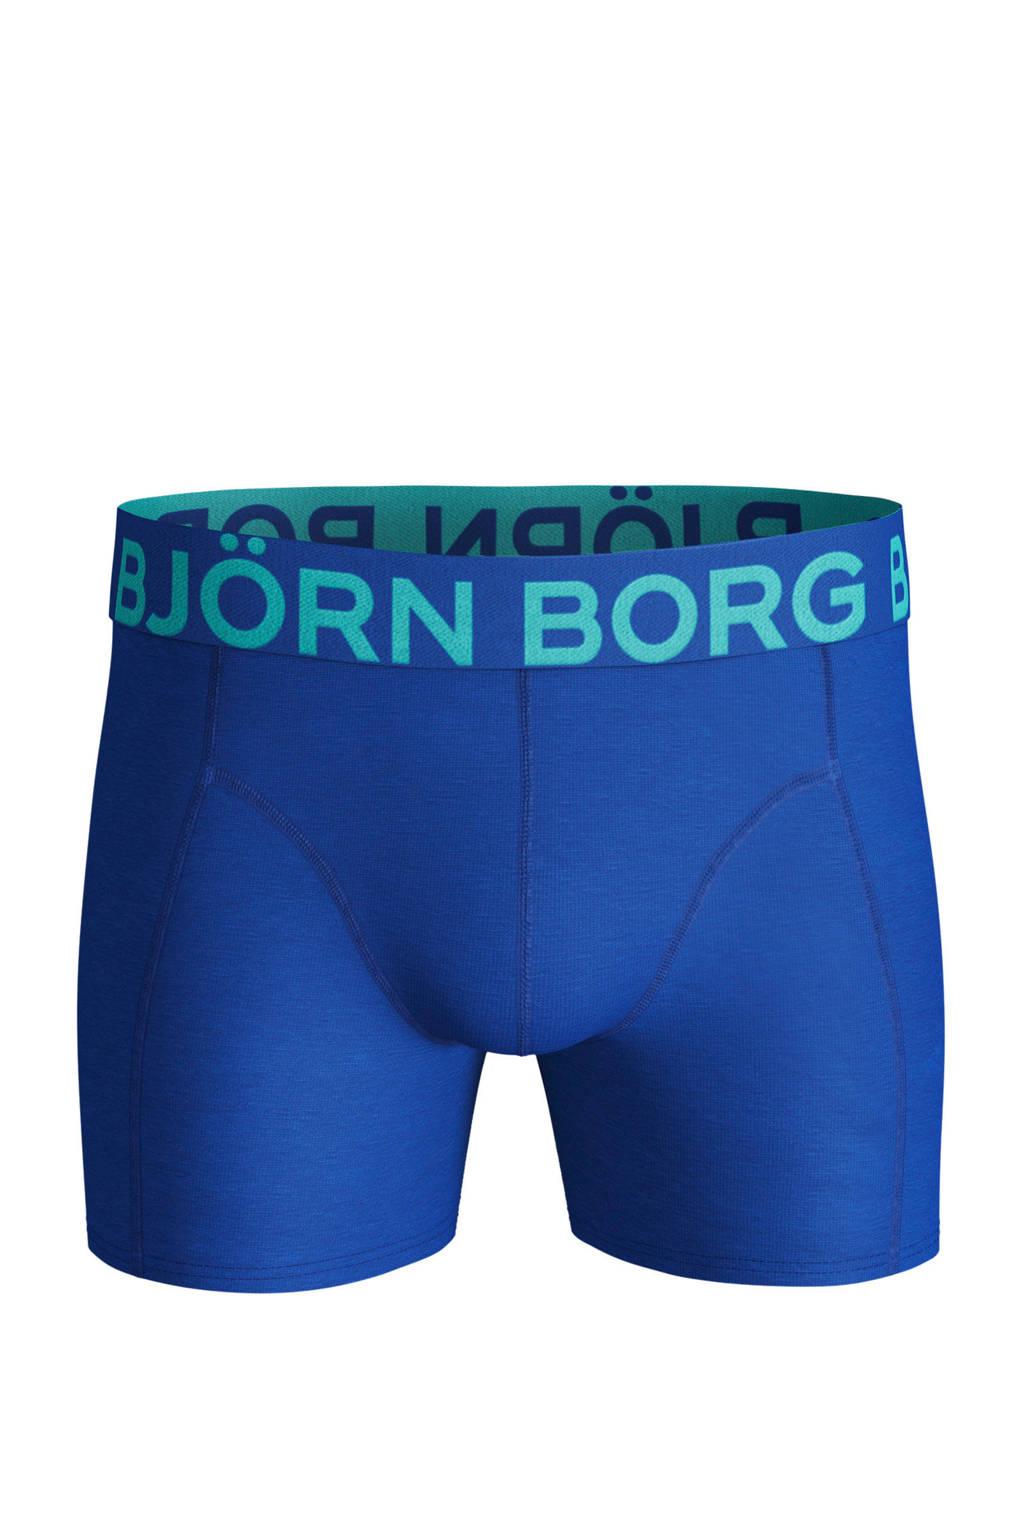 Björn Borg boxershort (set van 2), Blauw